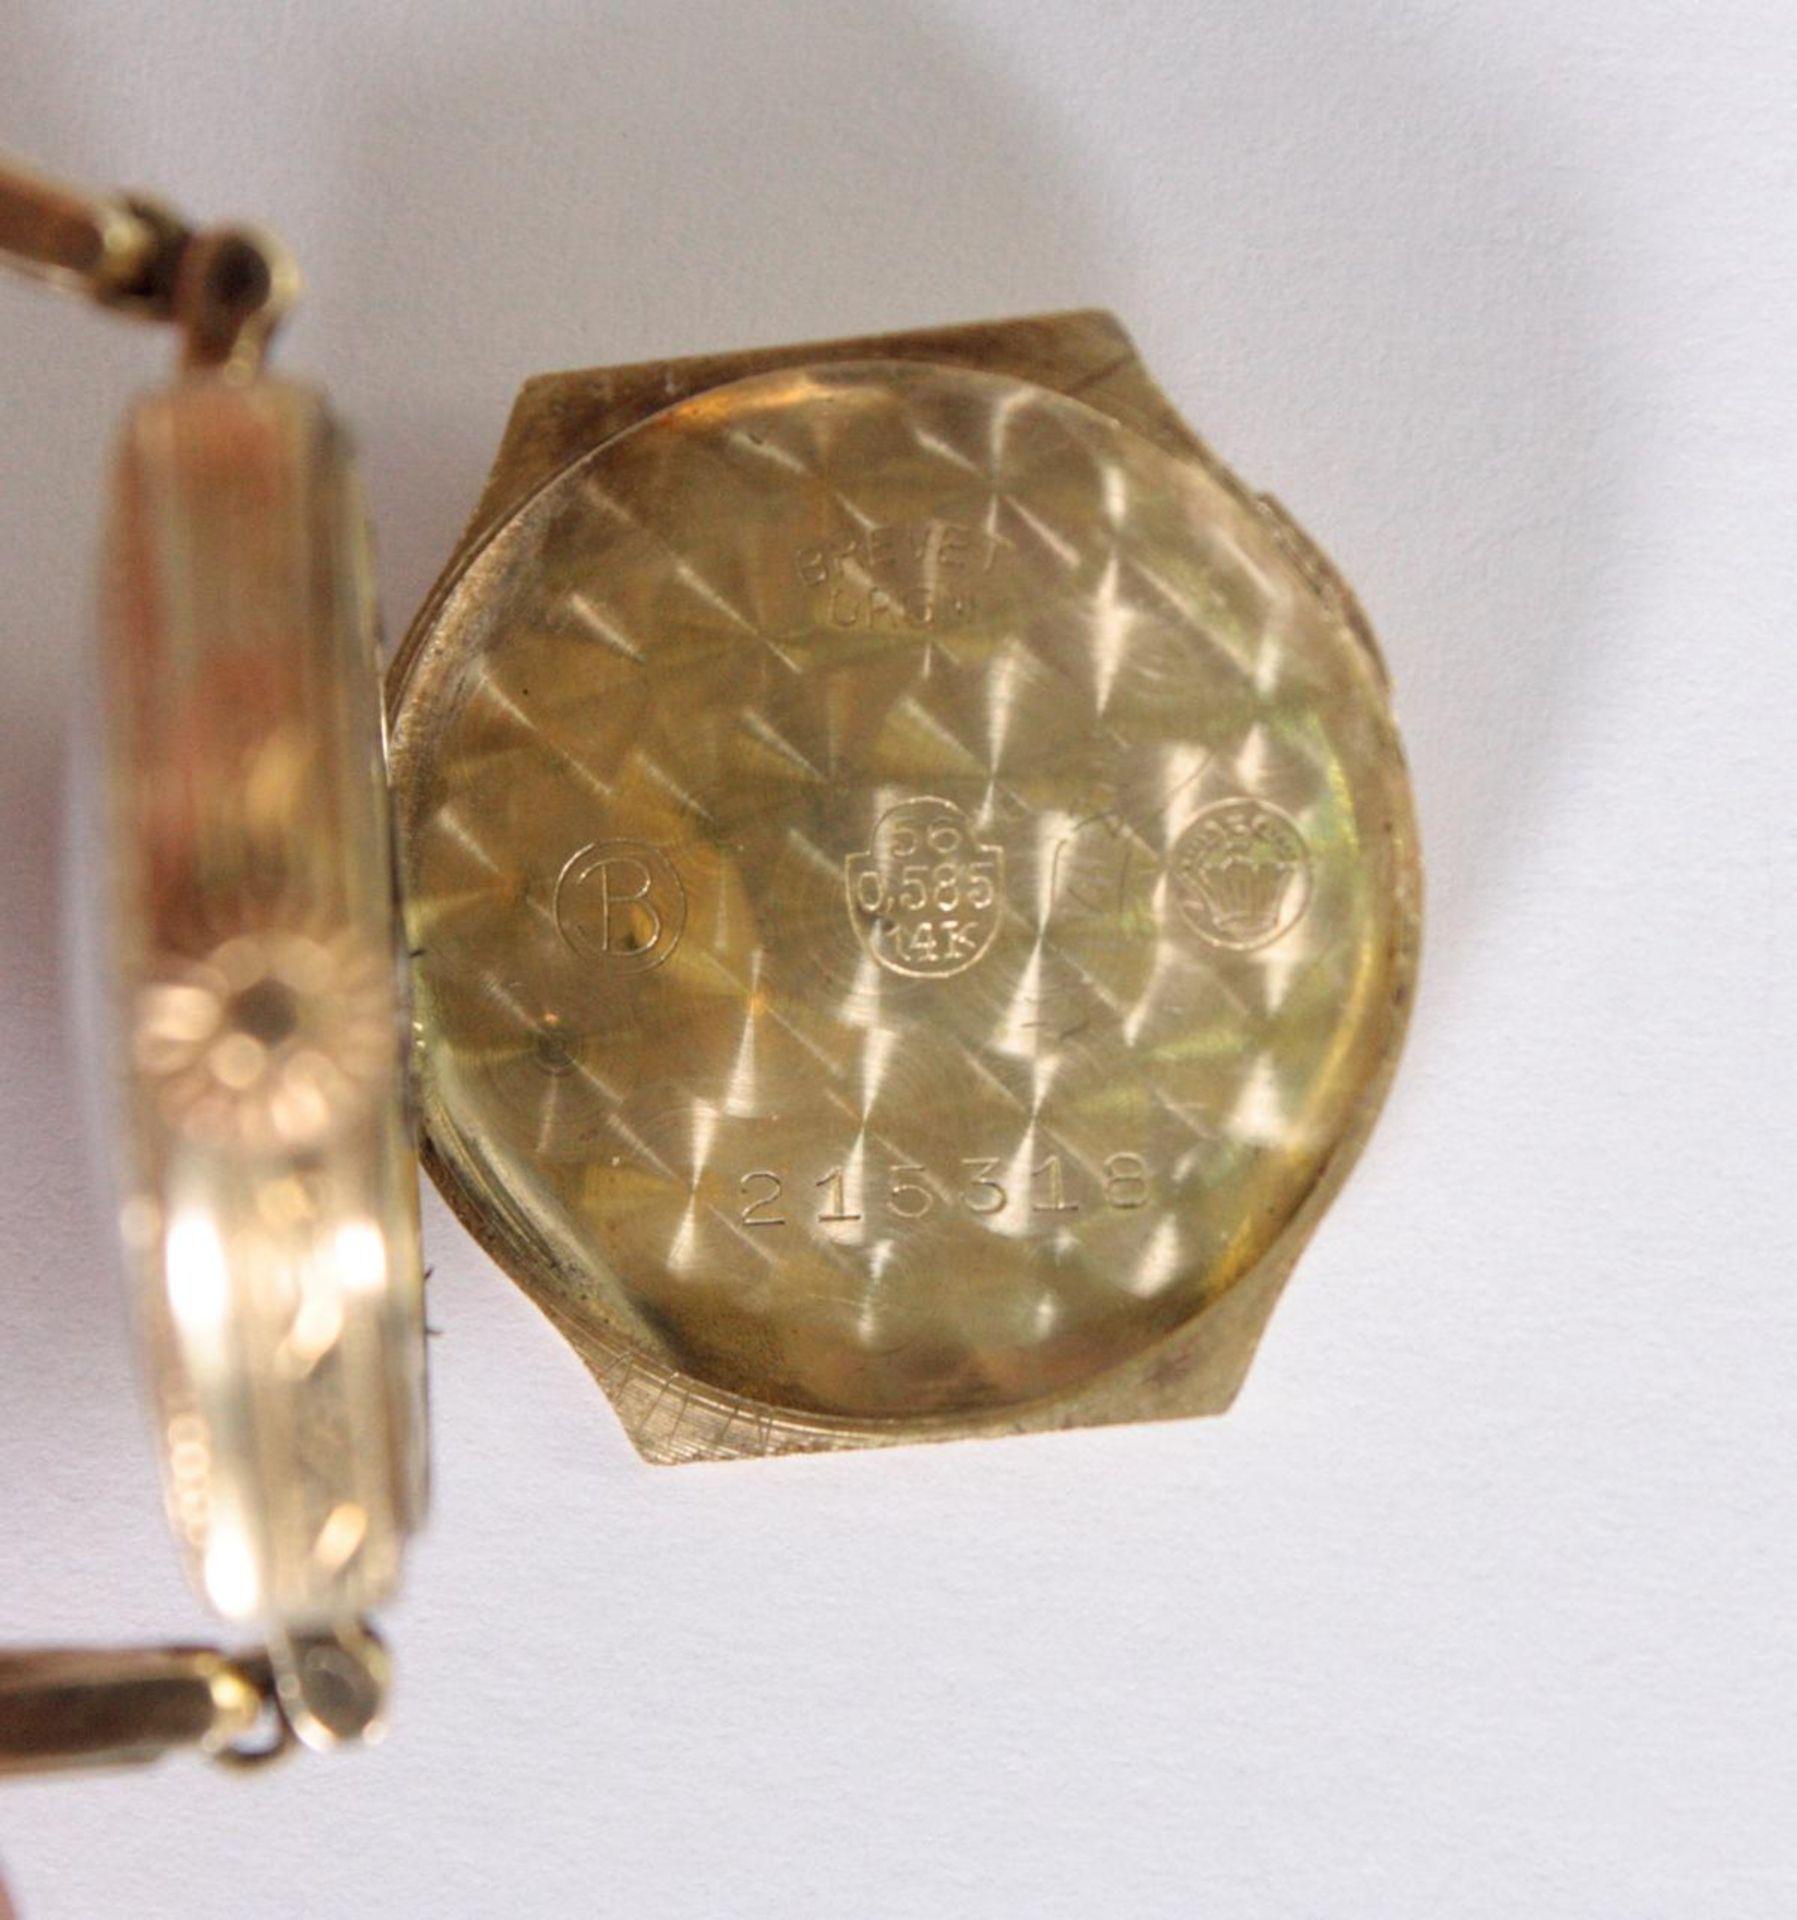 Antike Damenarmbanduhr, 14 Karat Gelbgold - Bild 5 aus 5